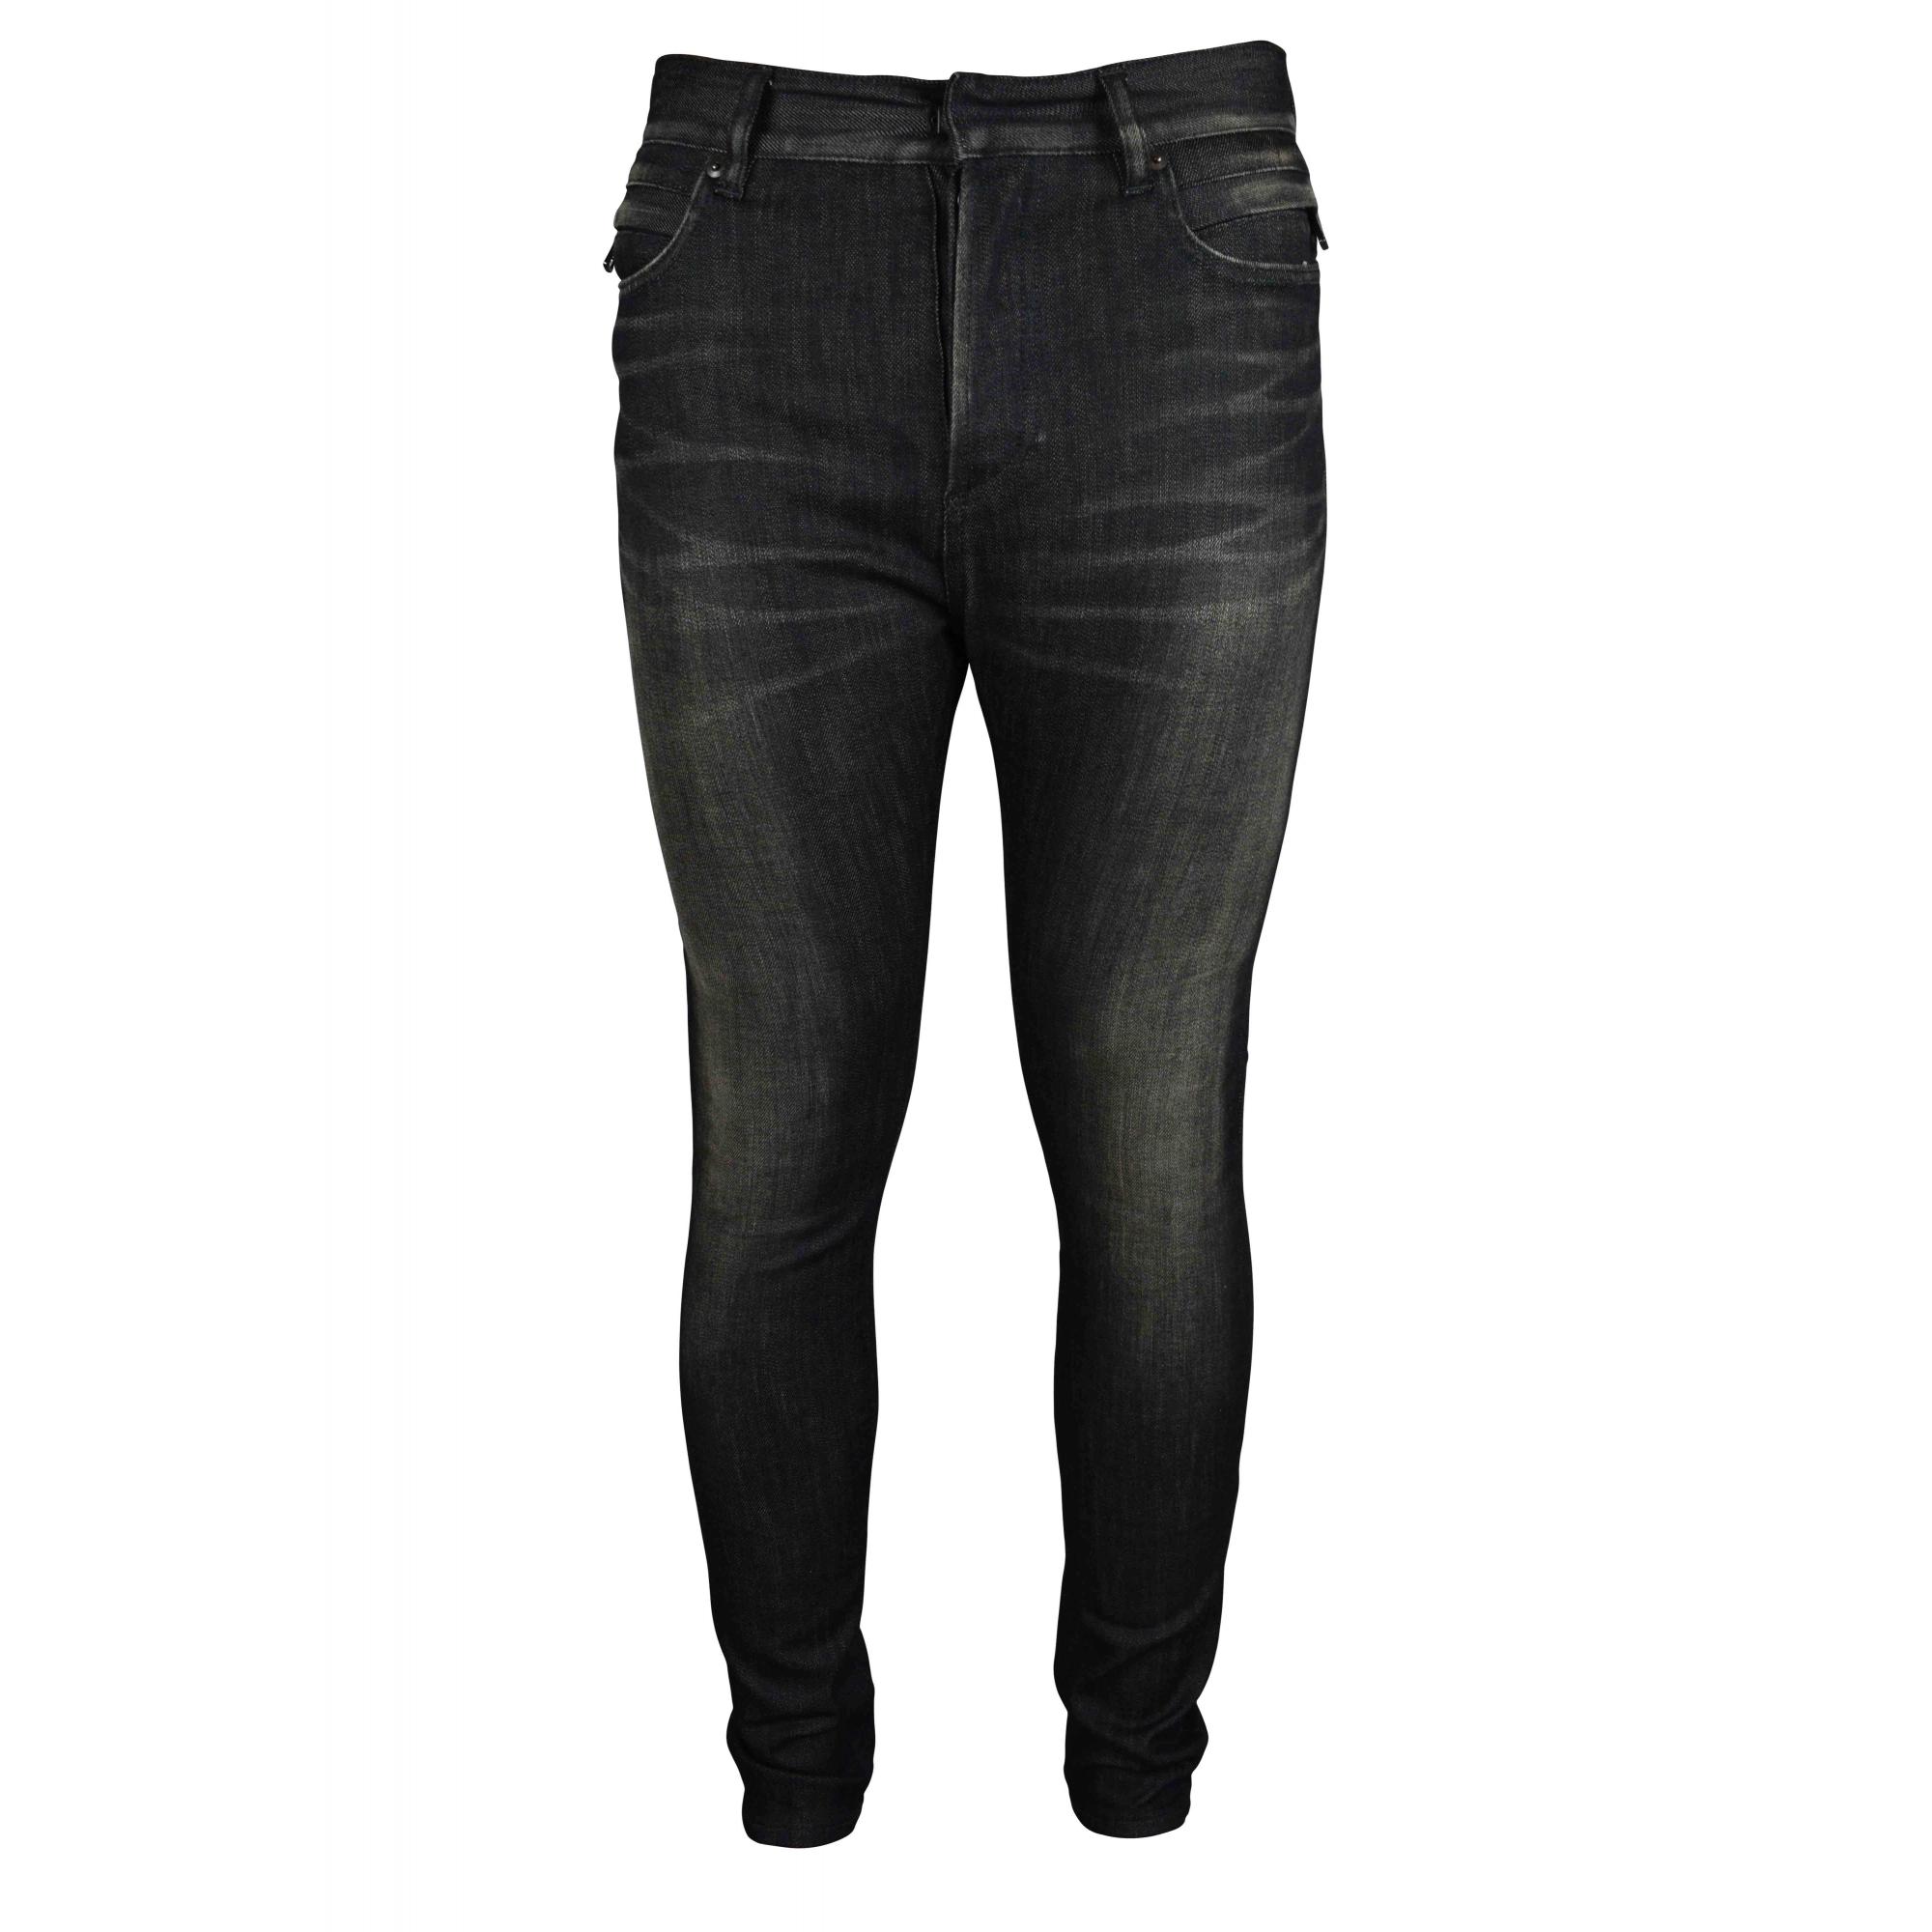 Black Balmain jeans.